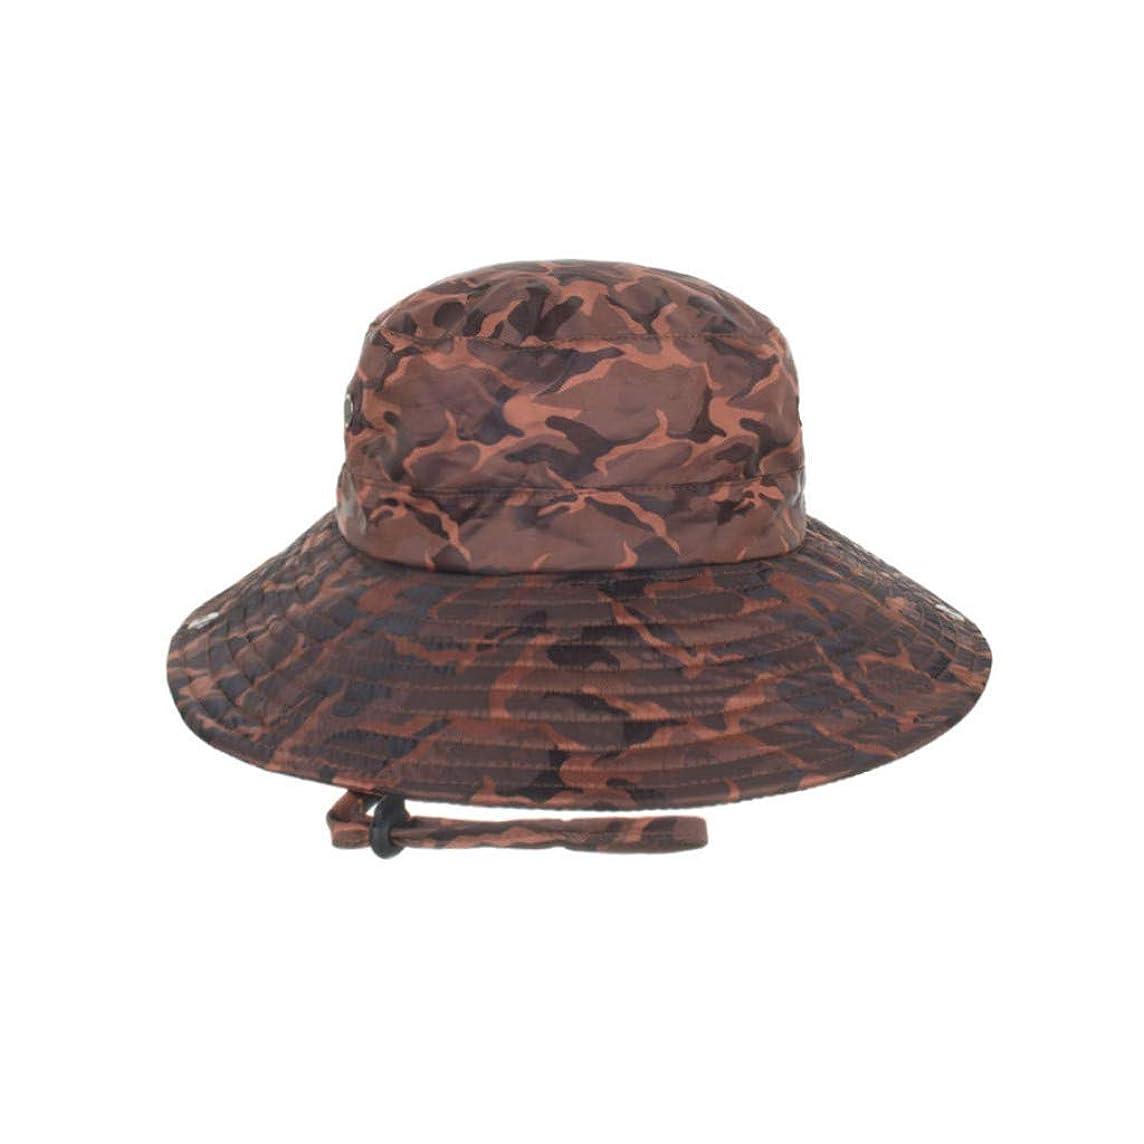 Jianekolaa Outdoor Sun Hat for Fishing Summer UPF 50+ Boonie Cap Drying Cap